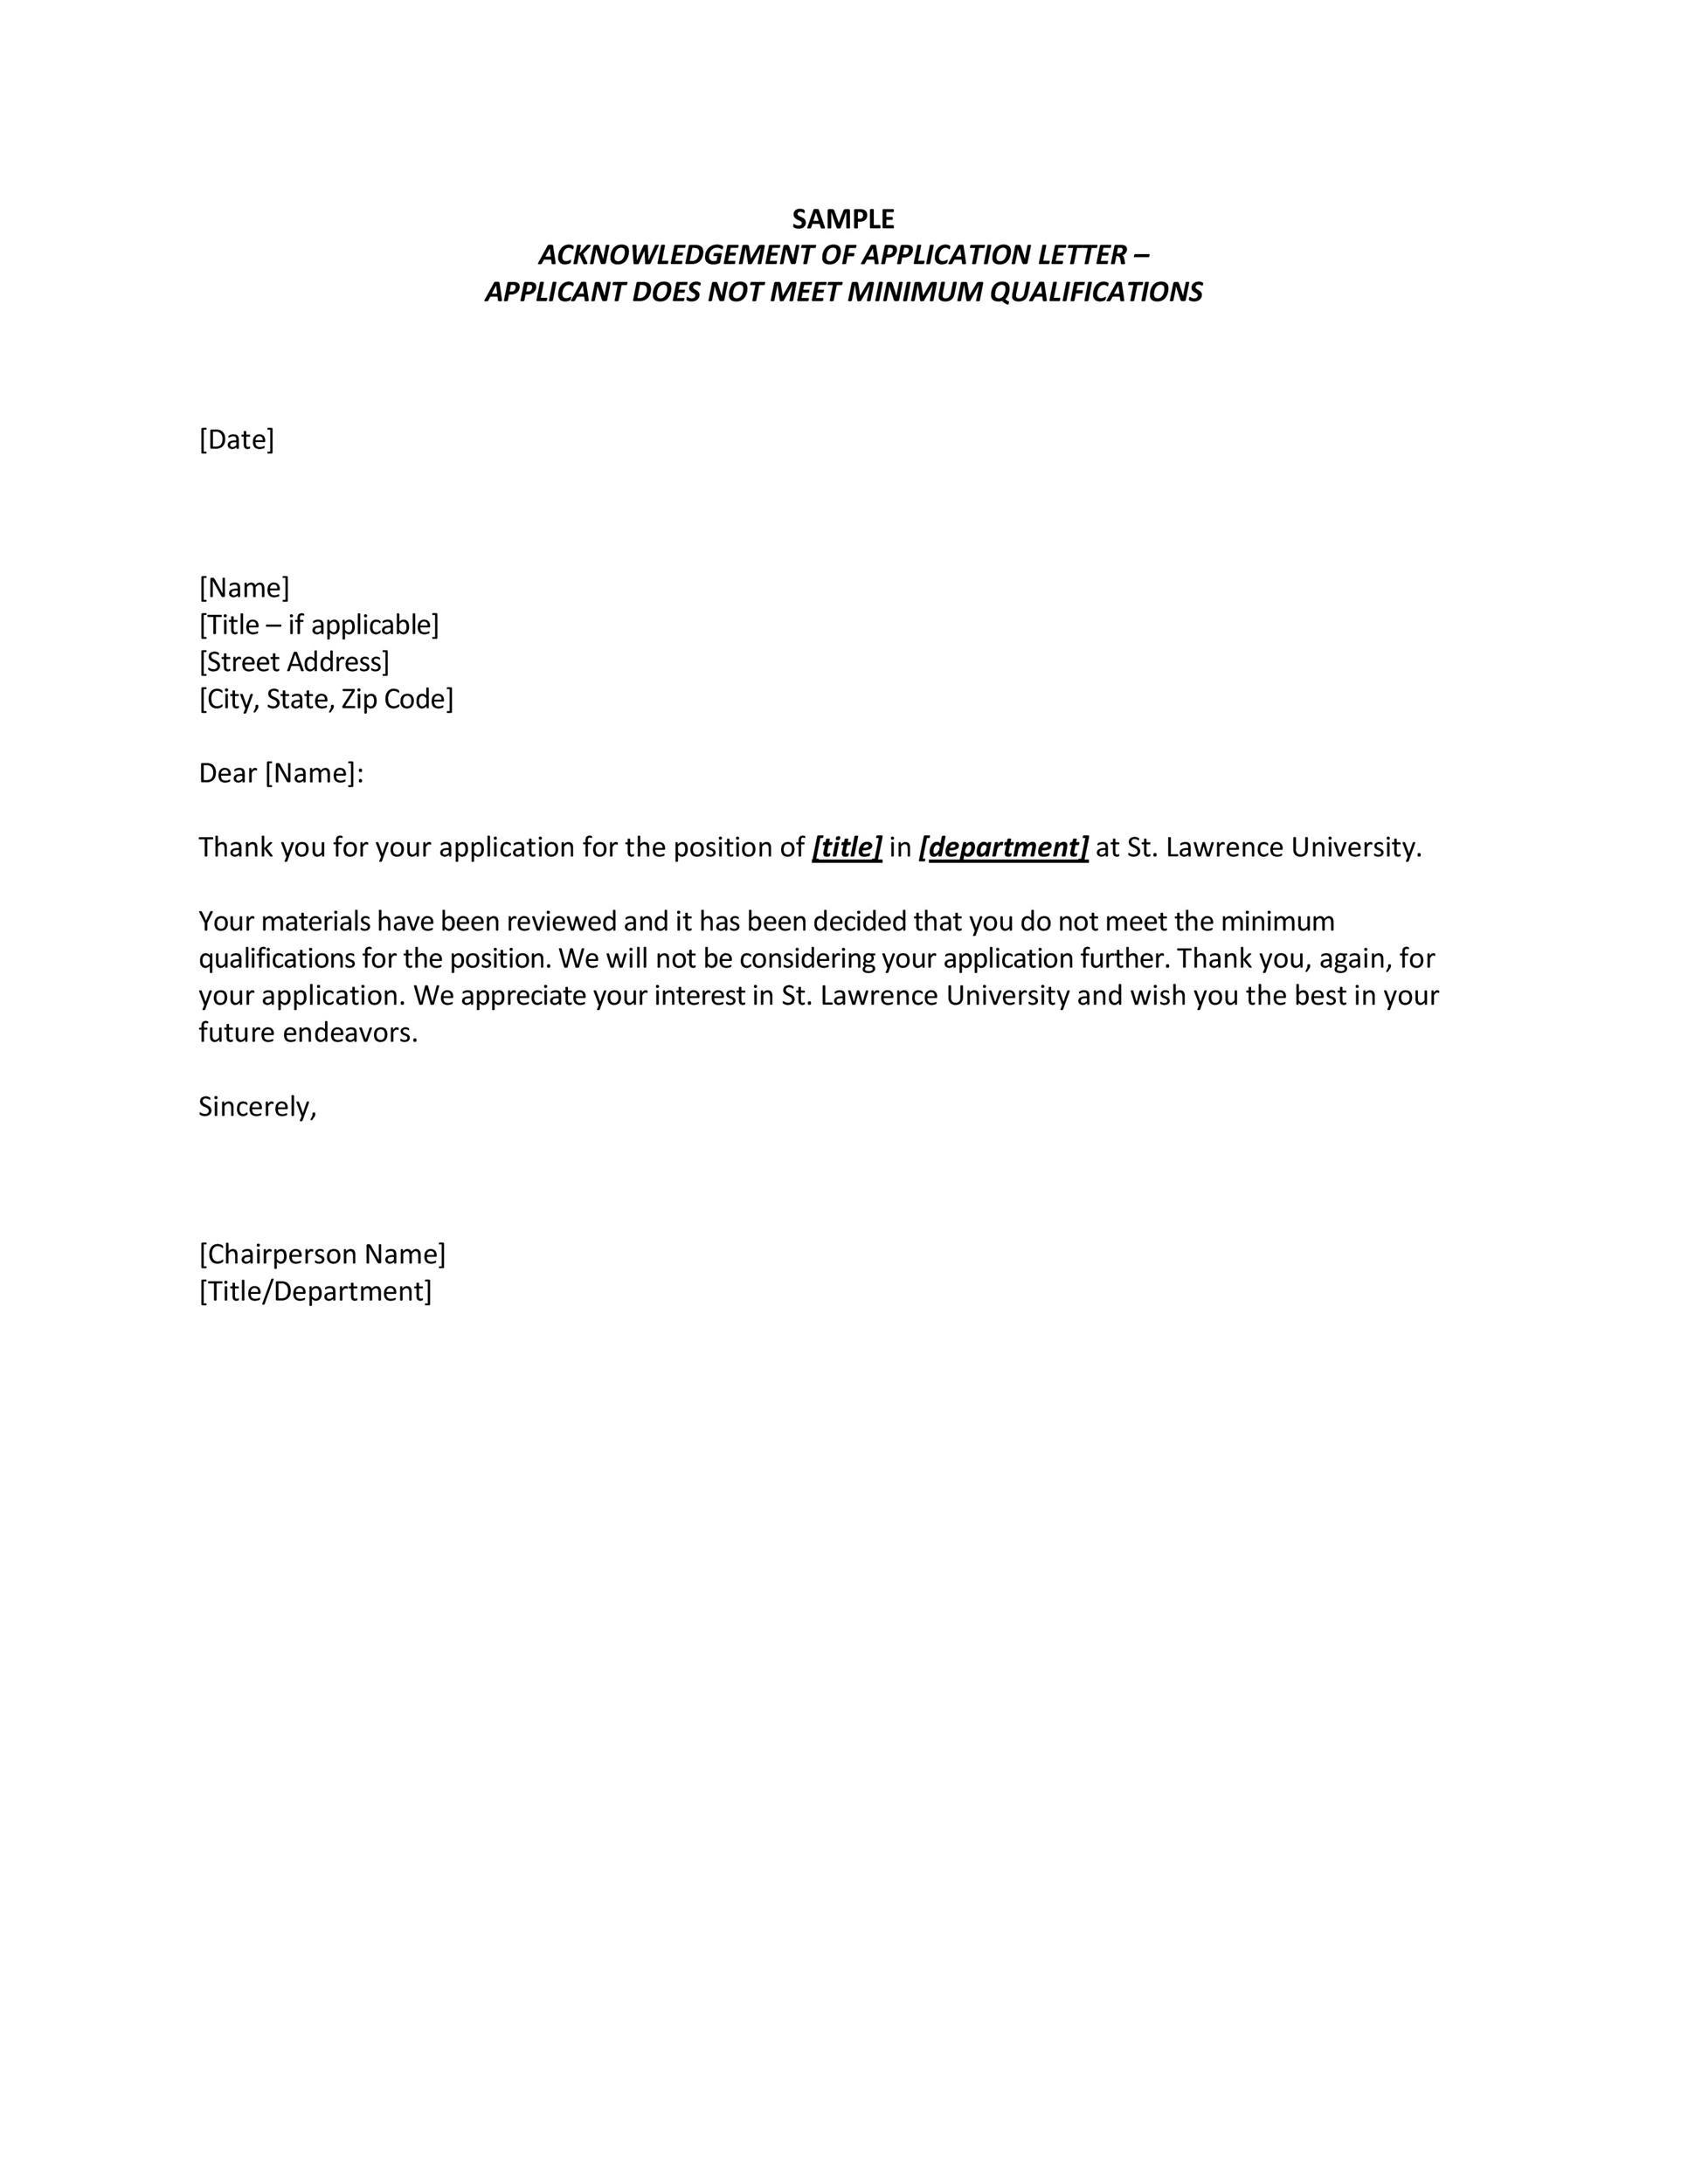 Free acknowledgement sample 28